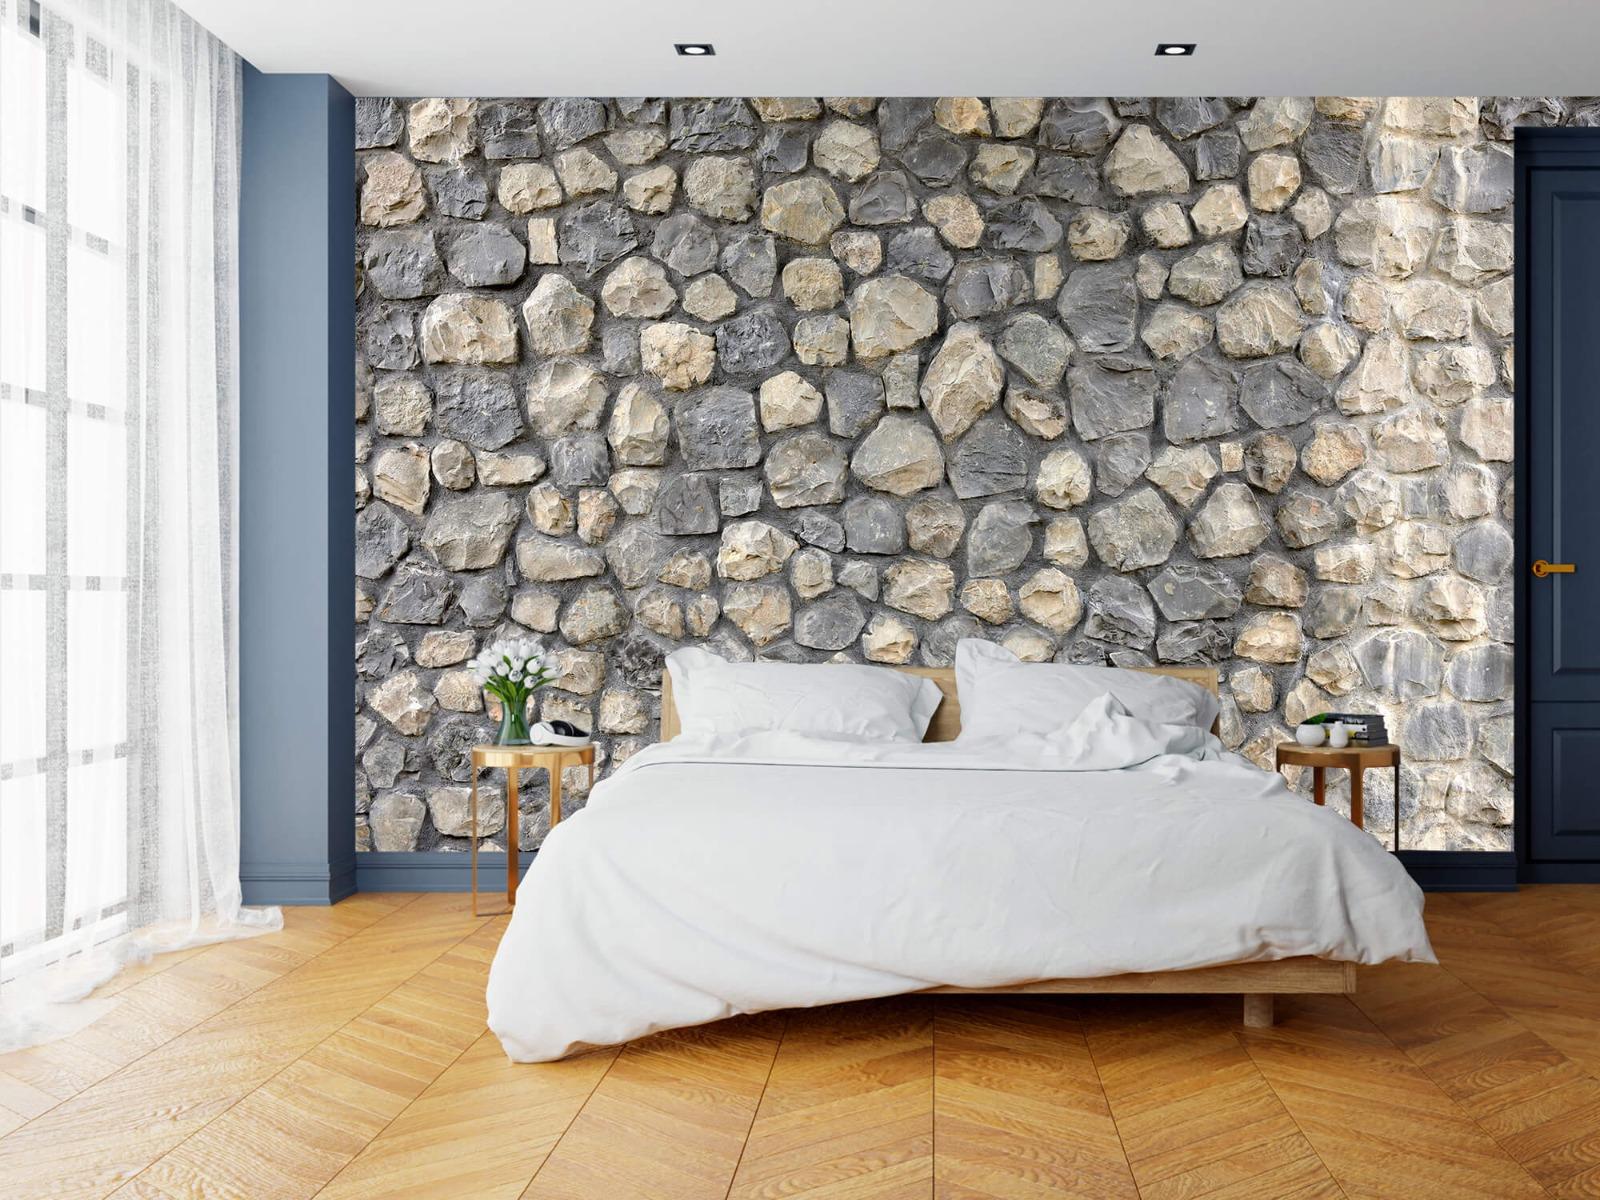 Steen behang - Breukstenen - Wallexclusive - Ontvangstruimte 4